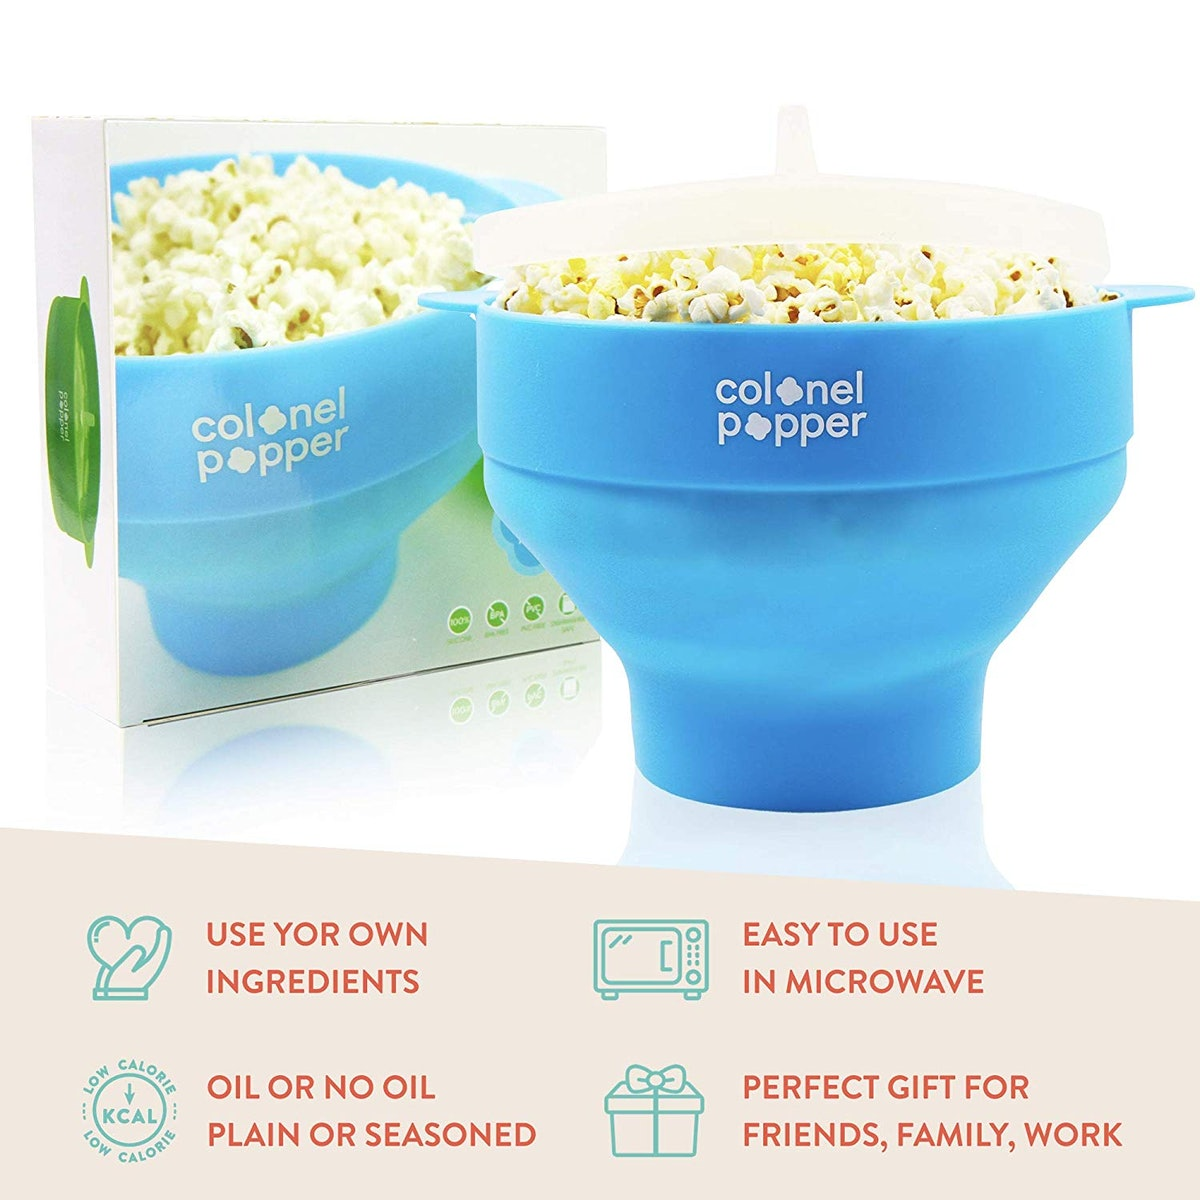 Colonel Popper Microwave Popcorn Bowl